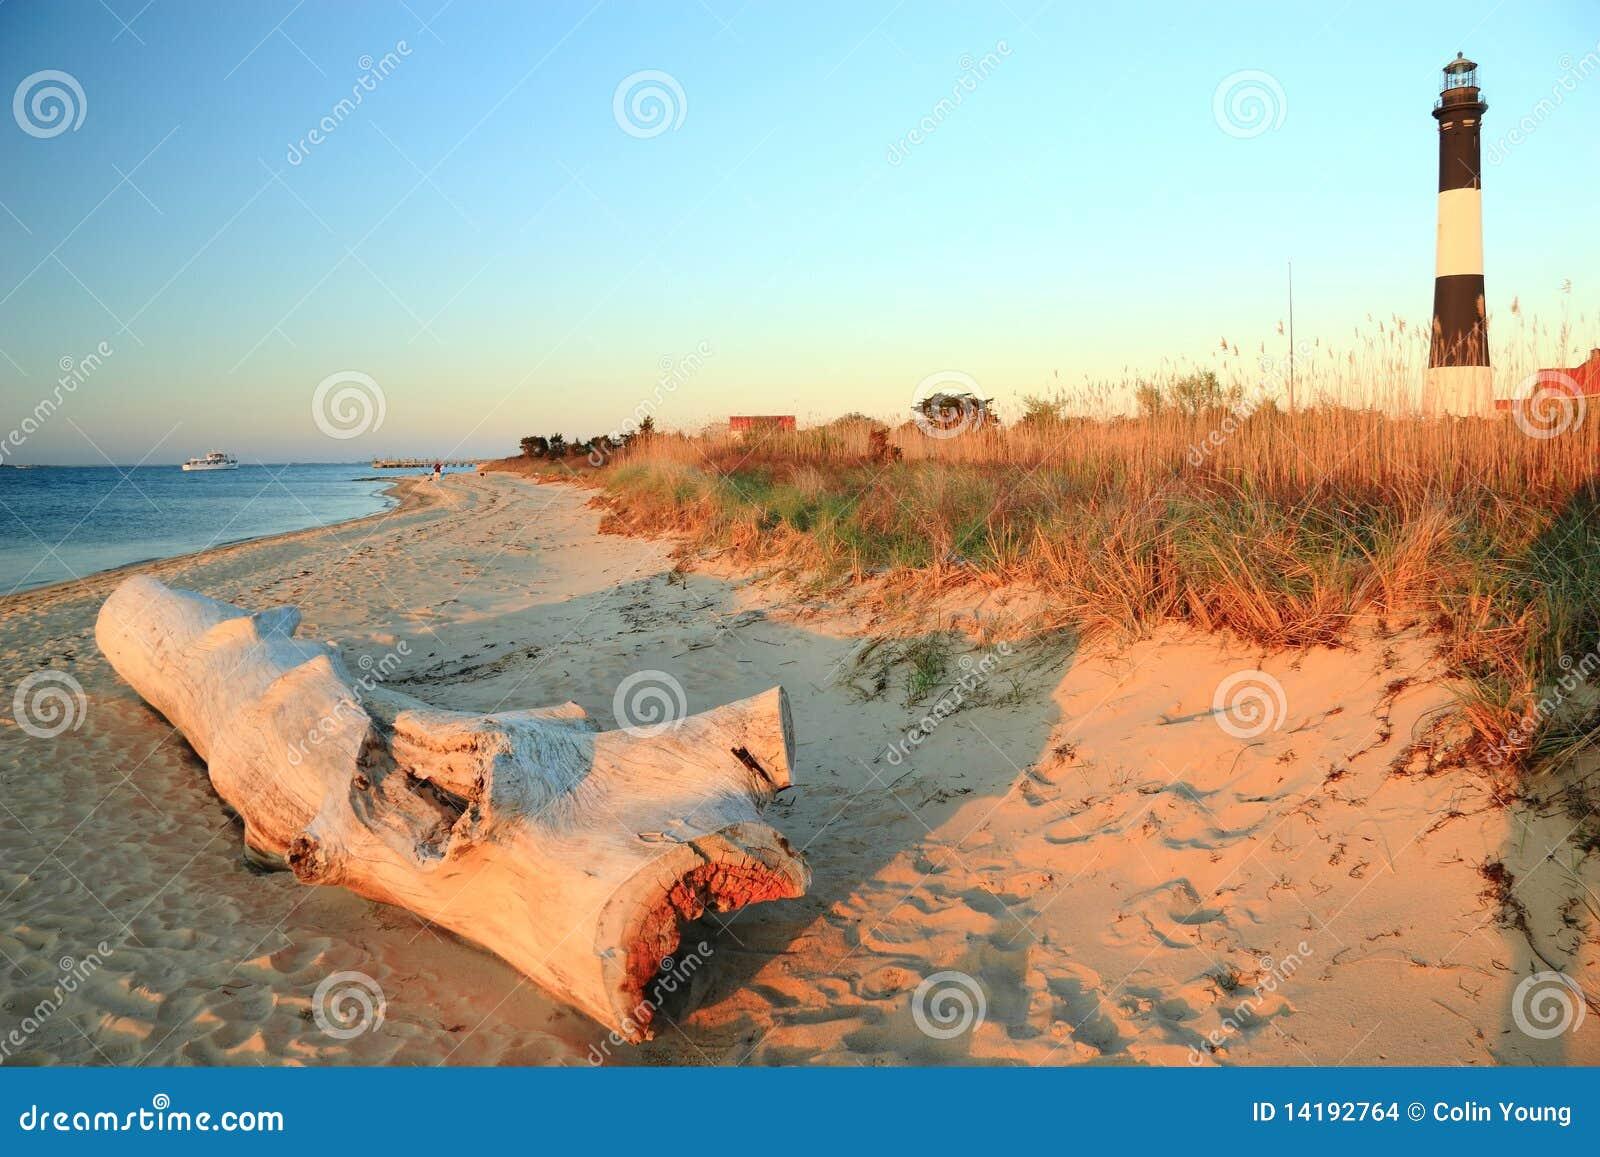 Driftwood on Long Island Sound